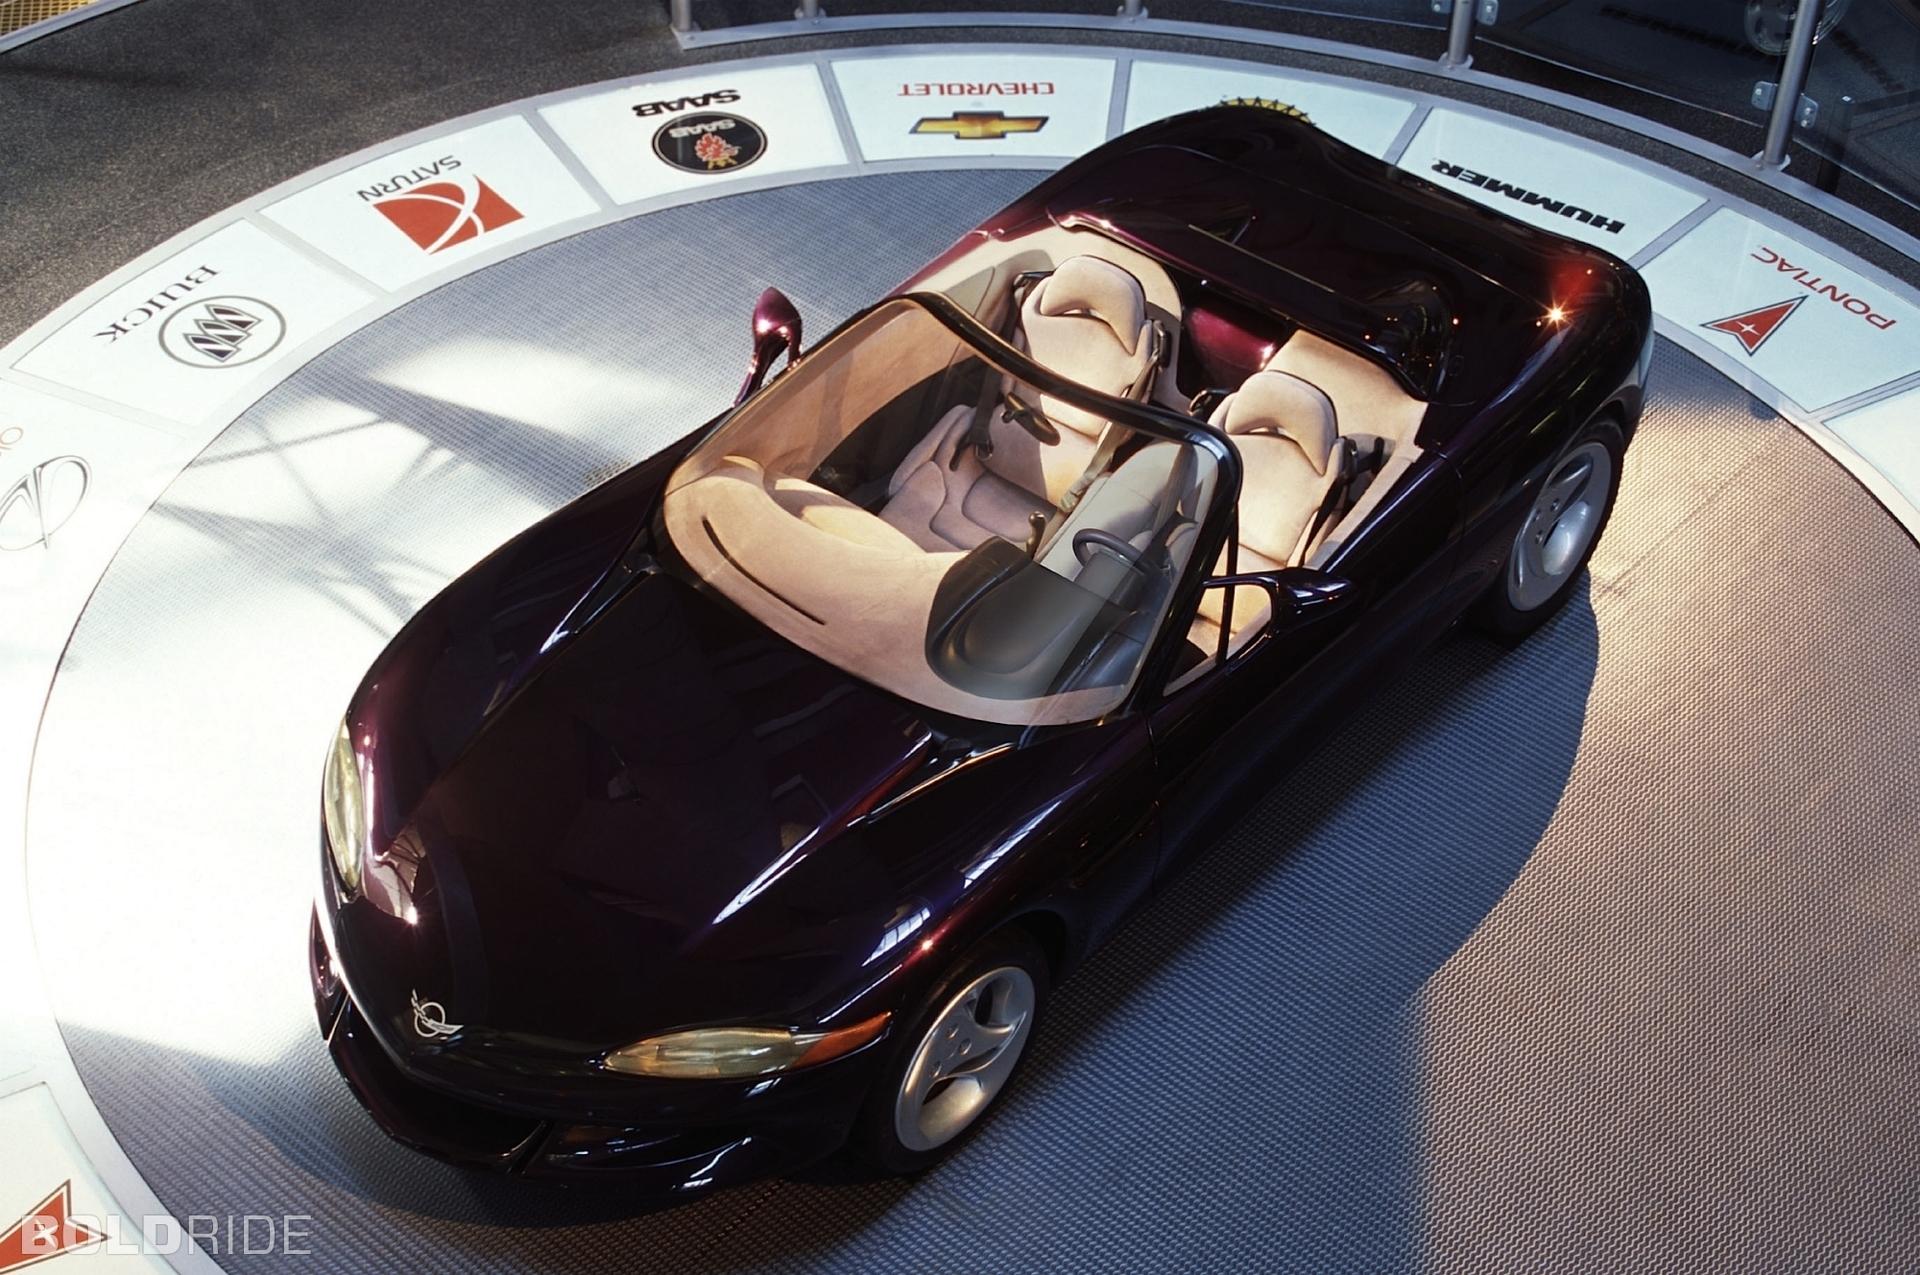 Chevrolet Corvette Sting Ray III Concept